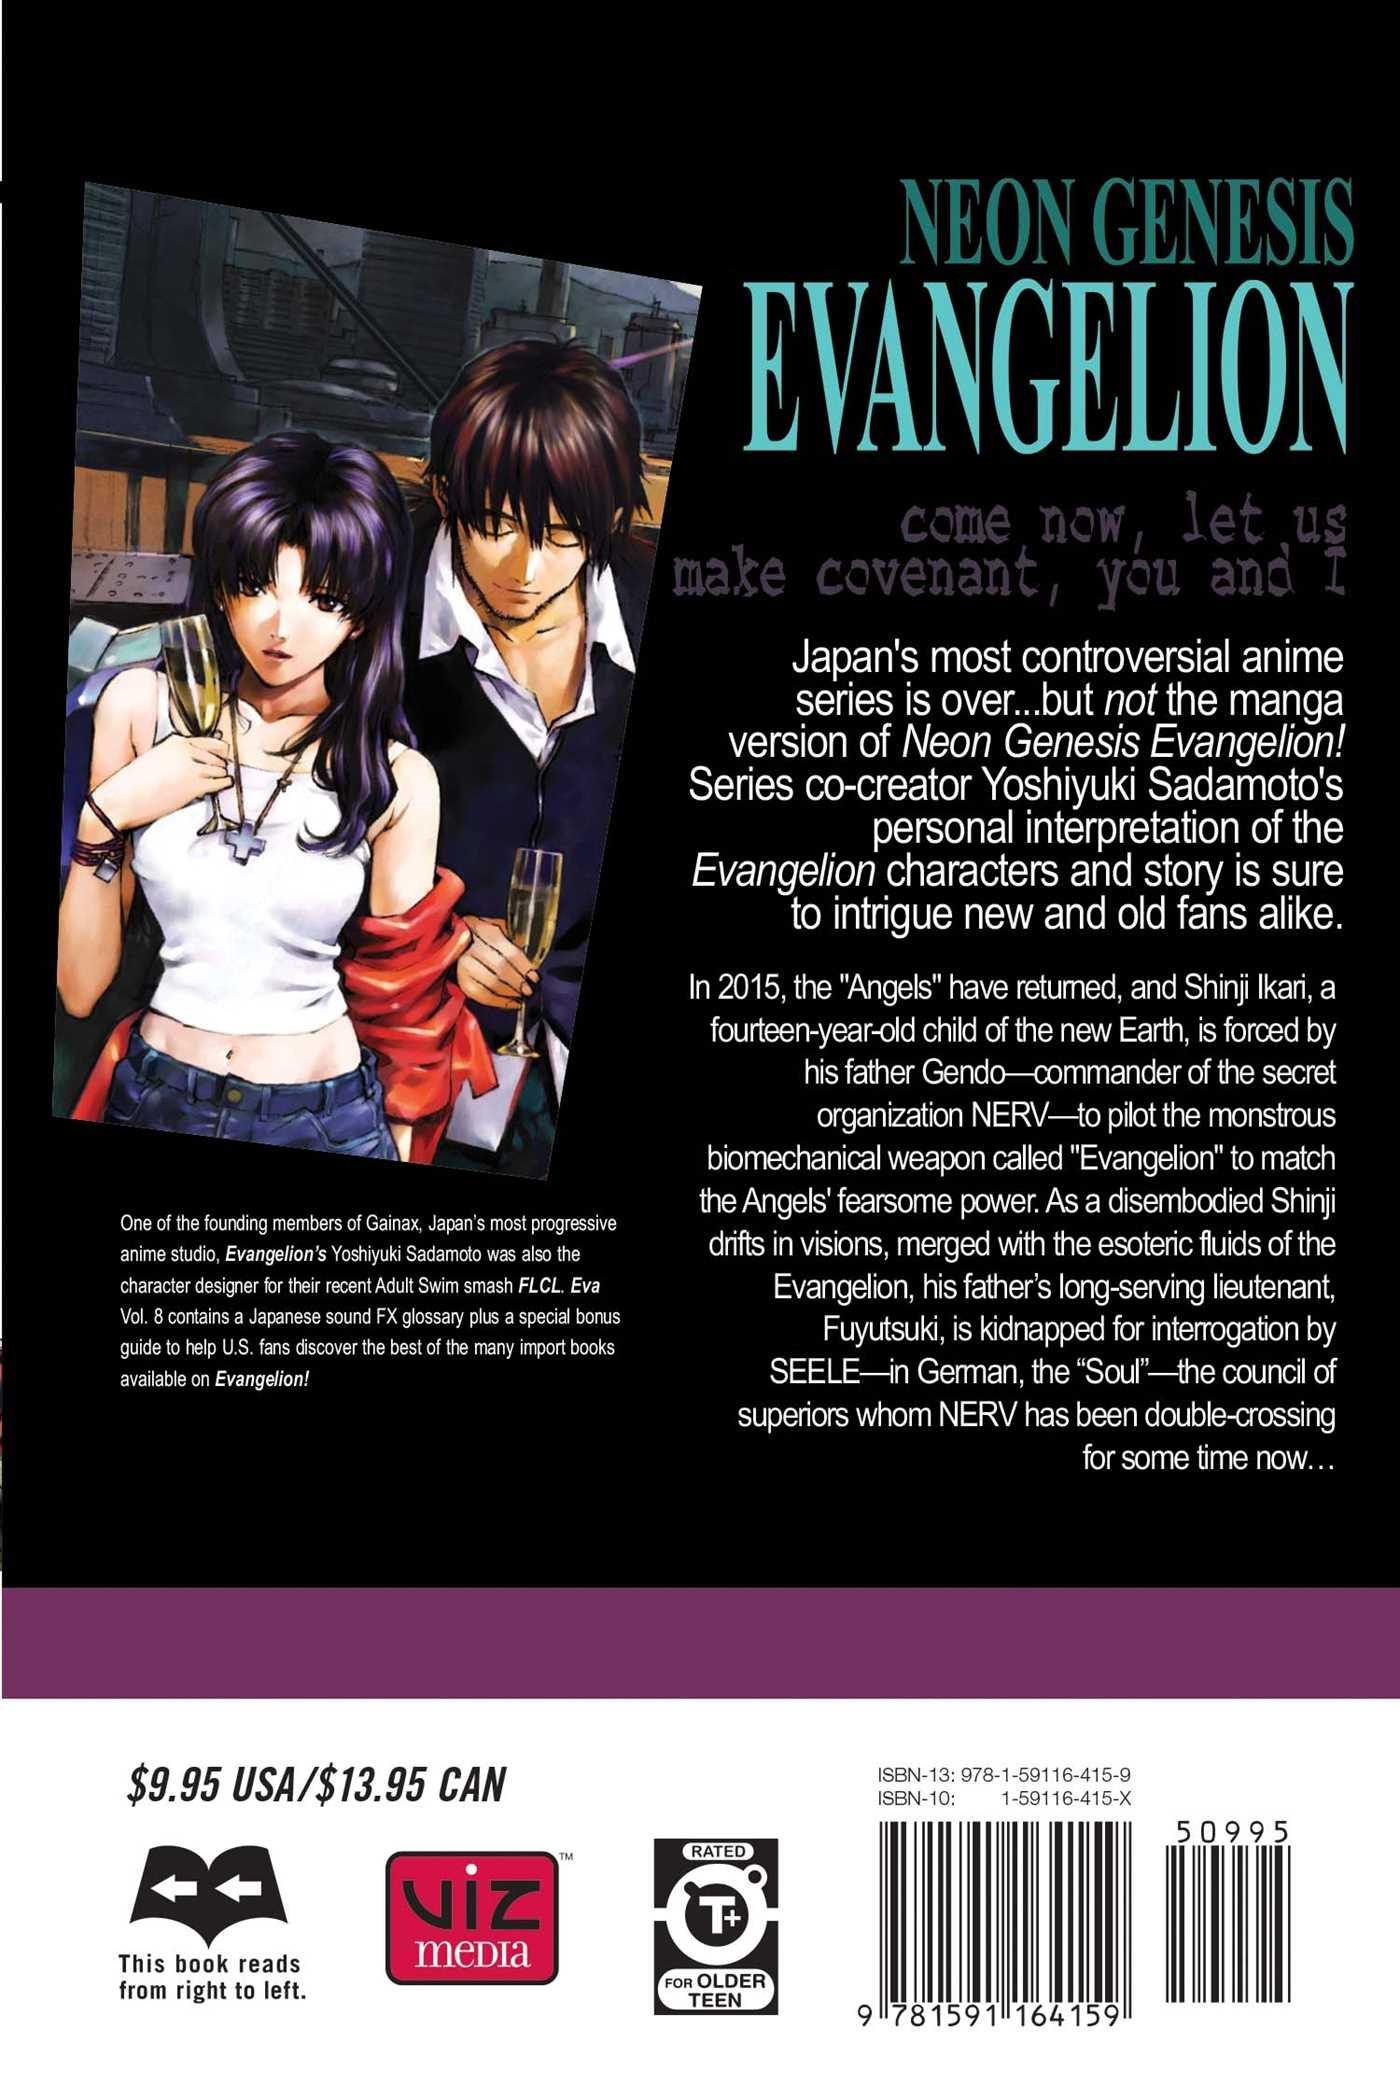 Amazon Neon Genesis Evangelion Vol 8 9781591164159 Yoshiyuki Sadamoto Books